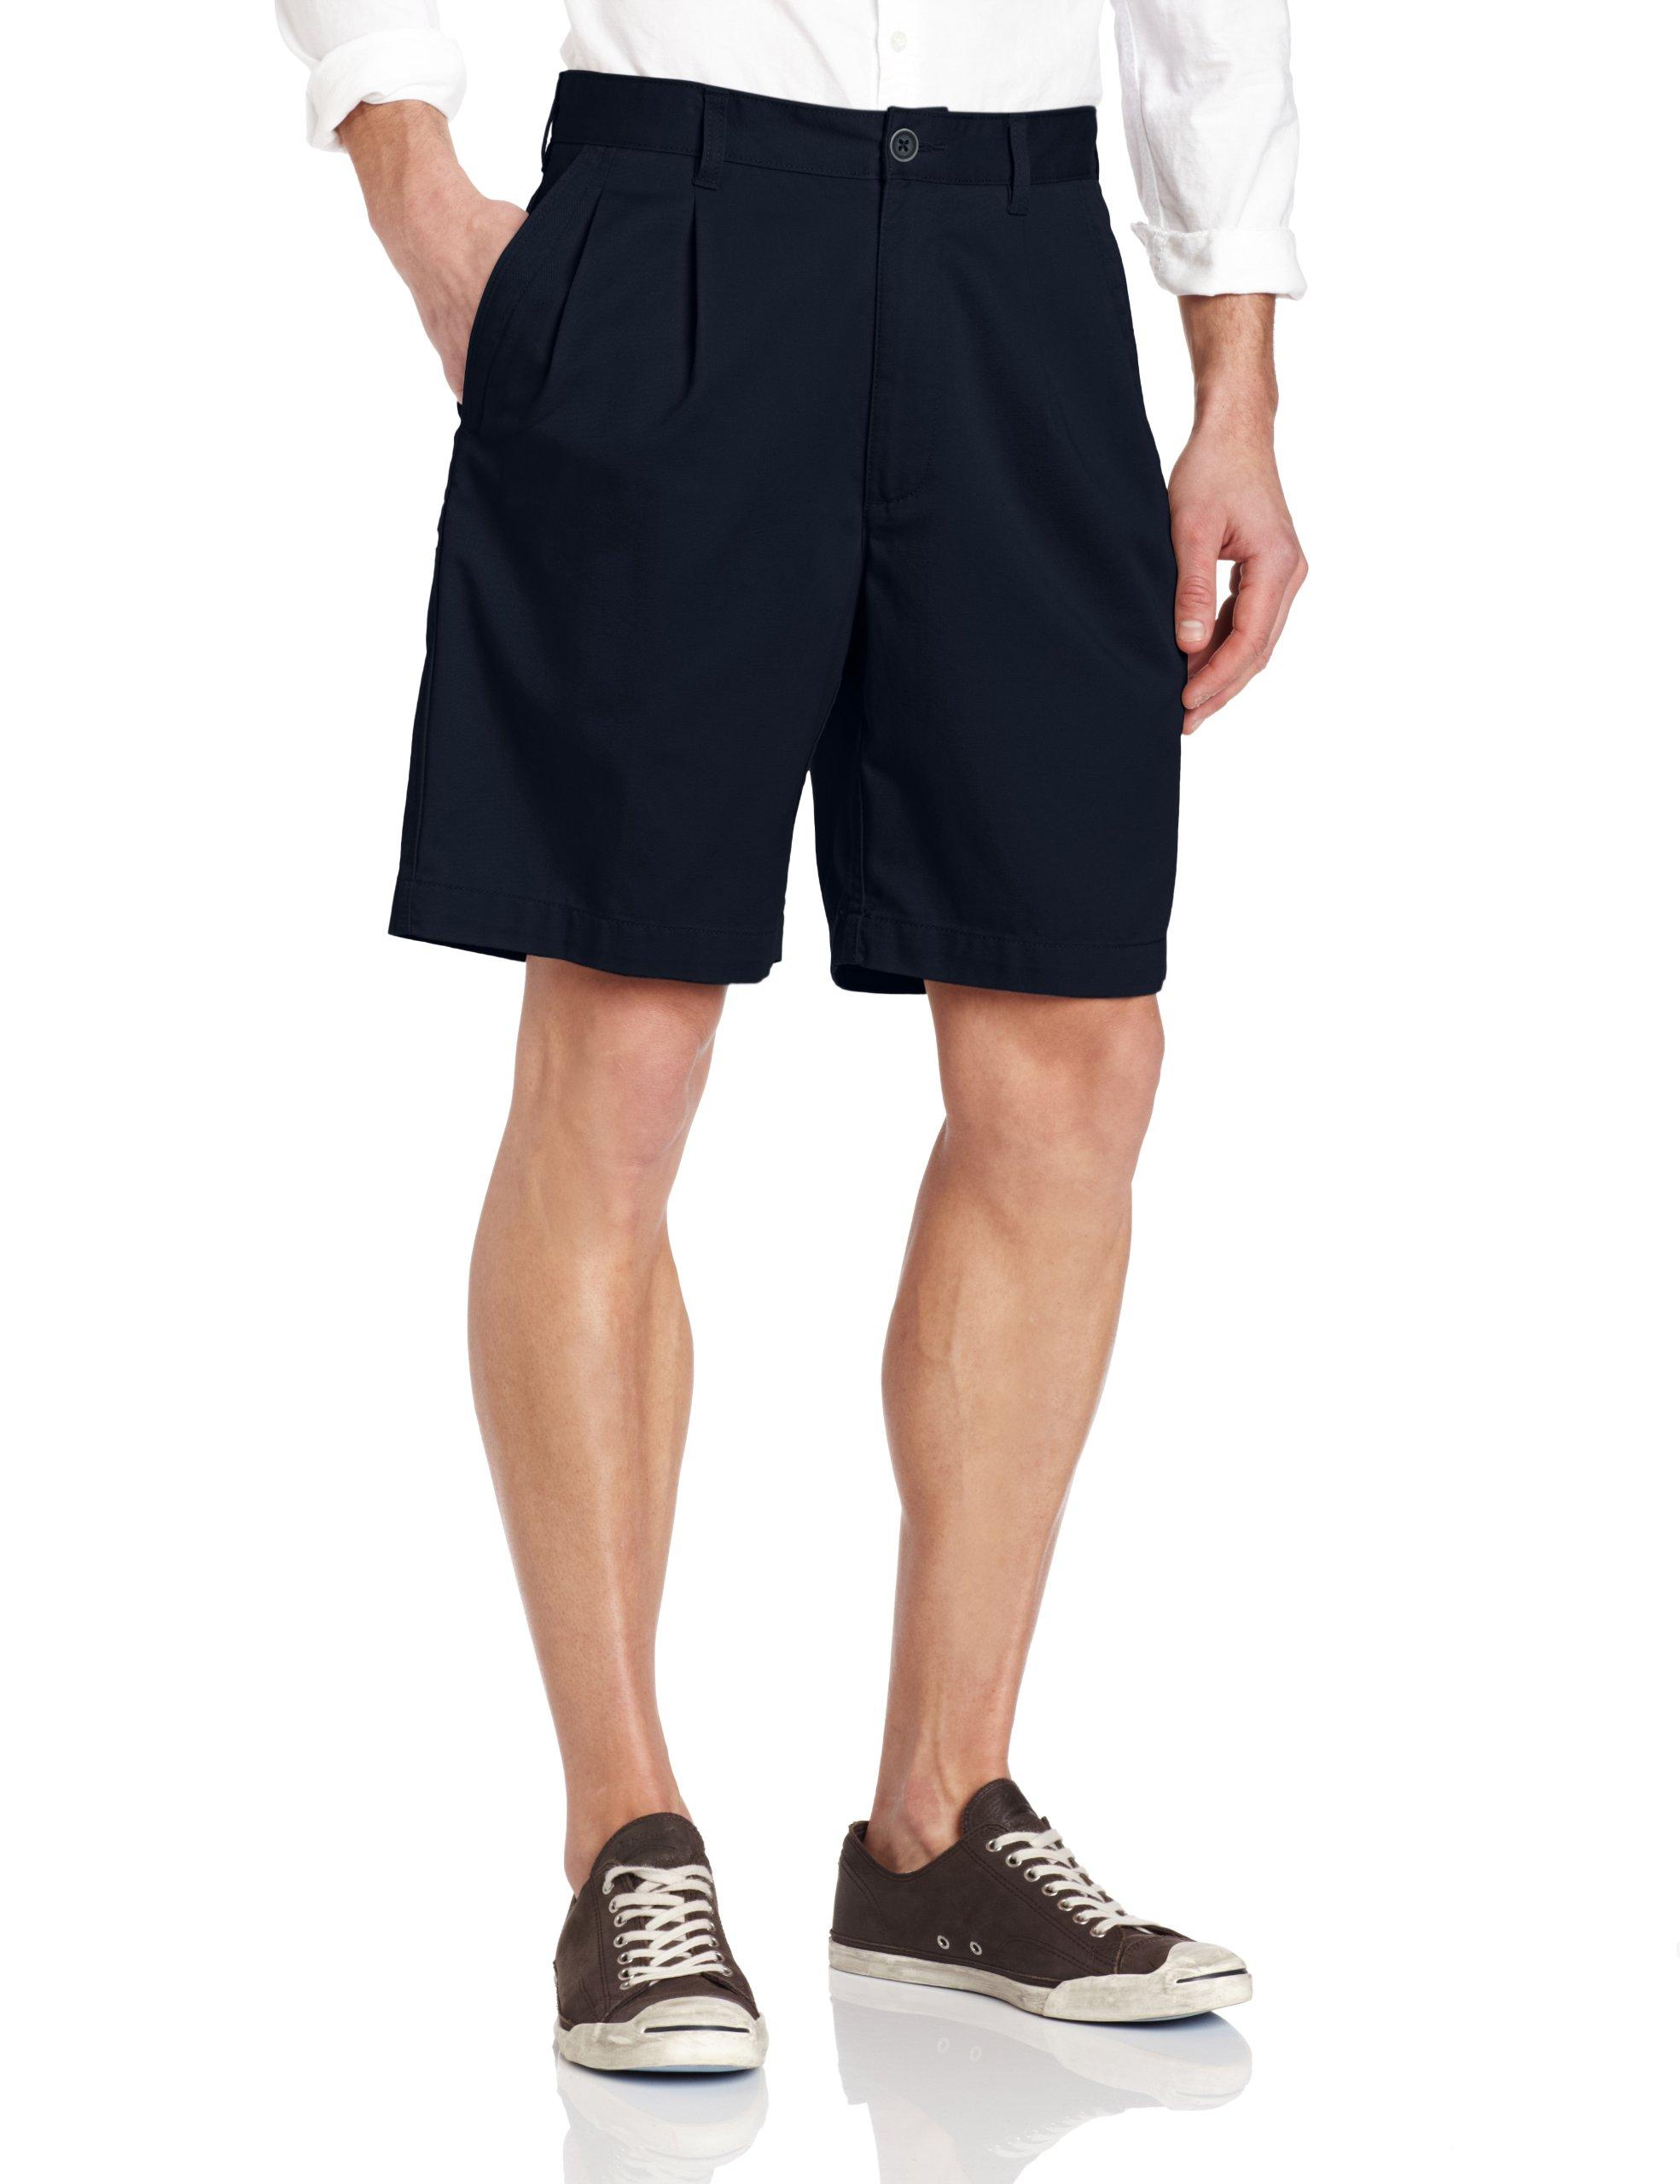 Savane Men's Eco-Start Classic Pleat Twill Short, Navy, 34